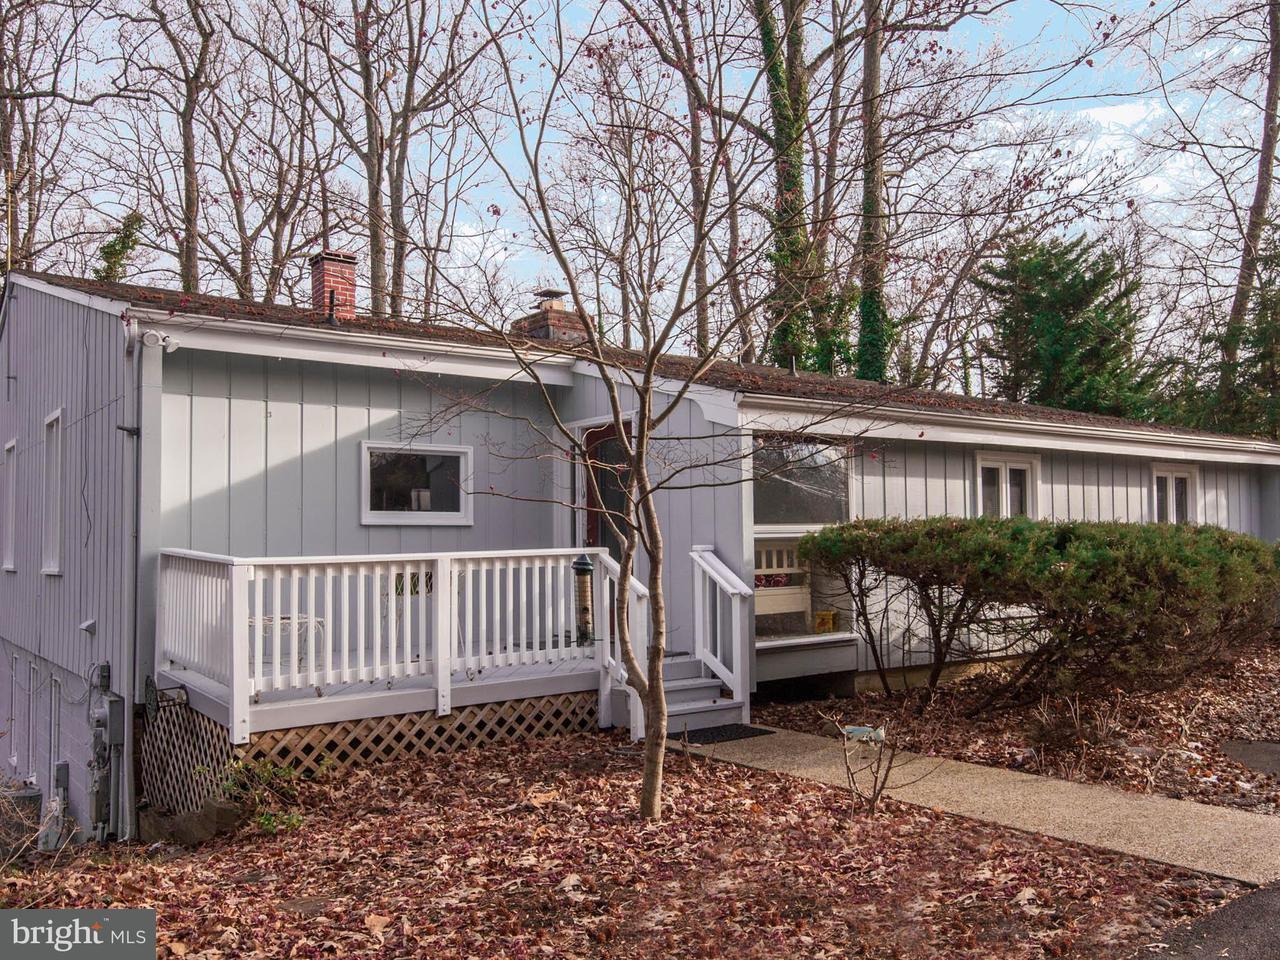 Single Family Home for Sale at 2654 OGLETON Road 2654 OGLETON Road Annapolis, Maryland 21403 United States